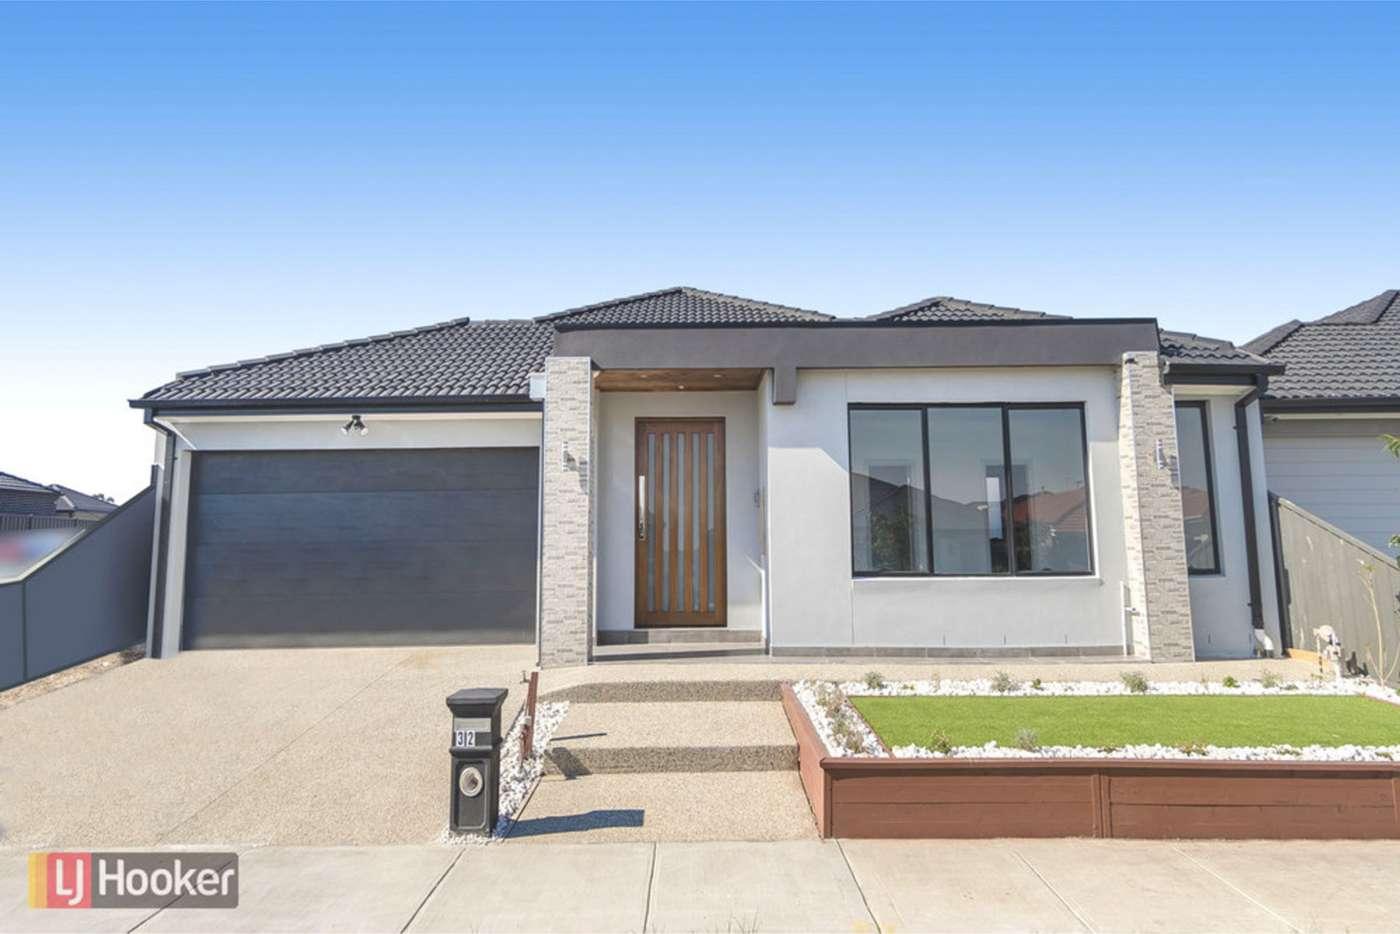 Main view of Homely house listing, 32 Quarter Street, Roxburgh Park VIC 3064